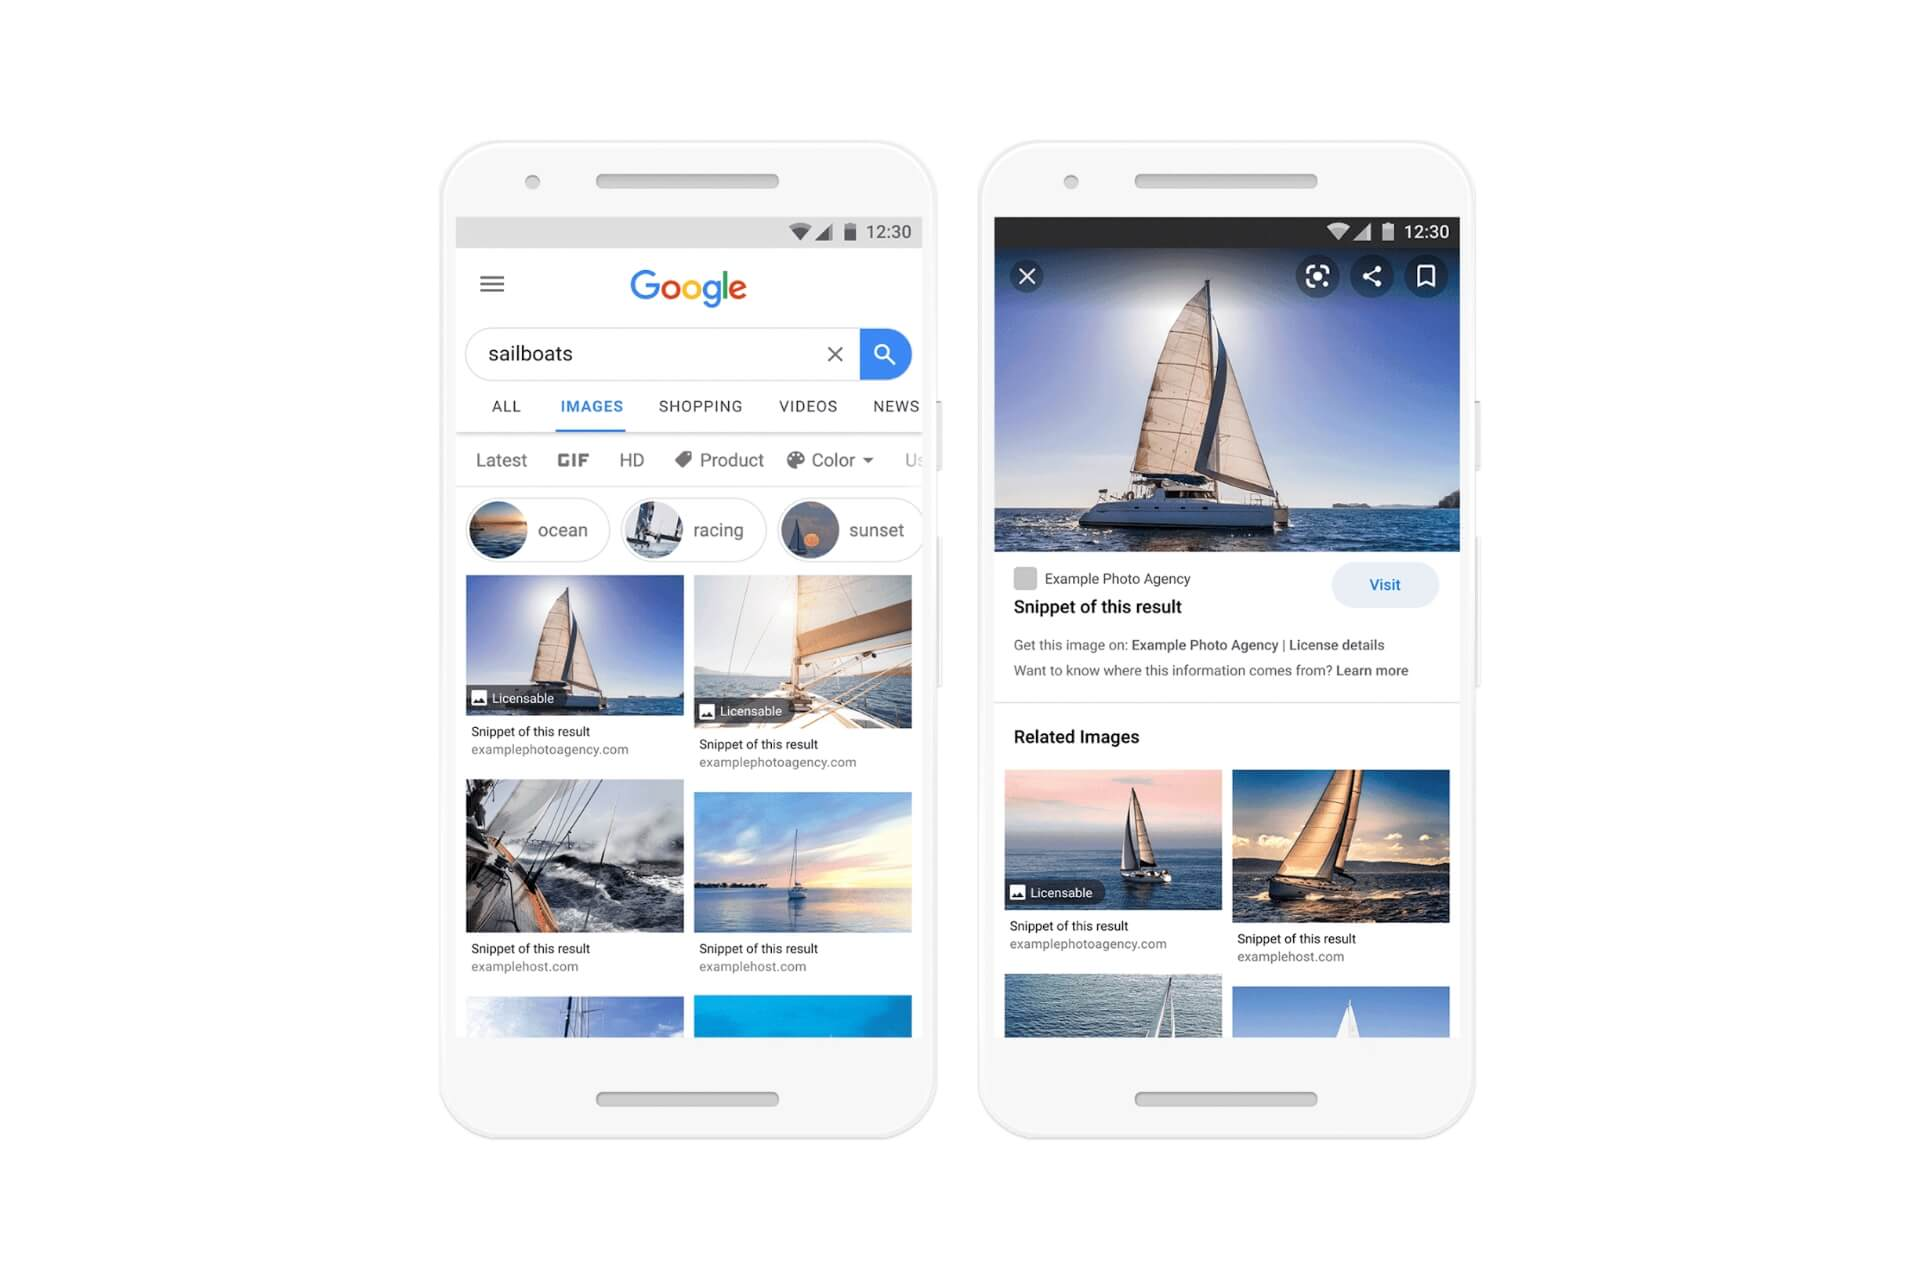 Google making changes in image licensing information on Google Images